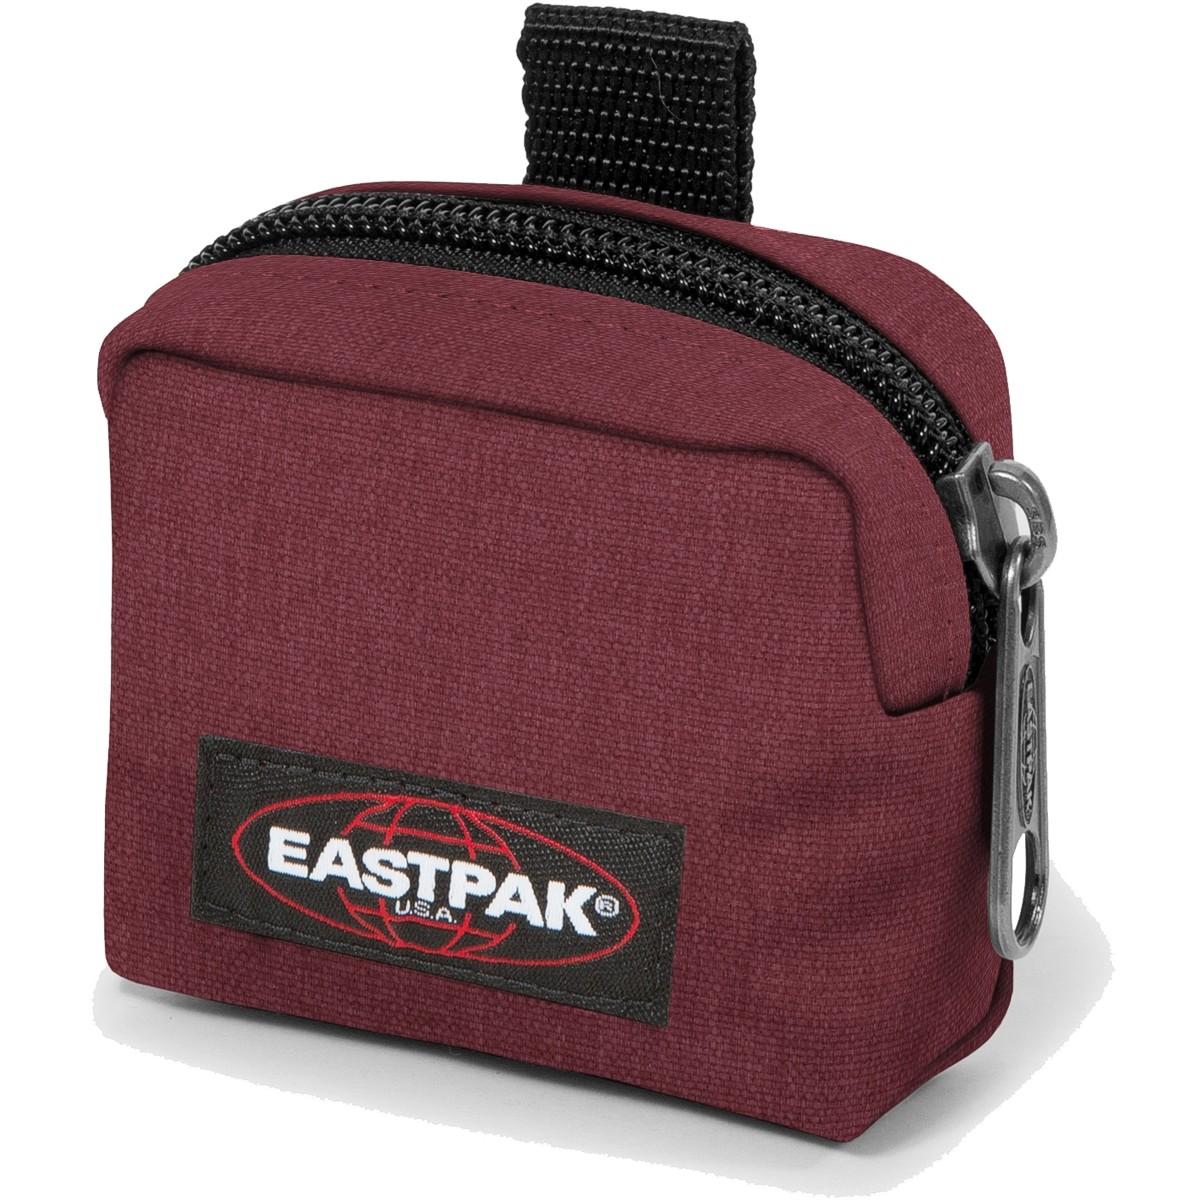 Eastpak Schlüsselanhänger-Bag »Stalker« Crafty Win